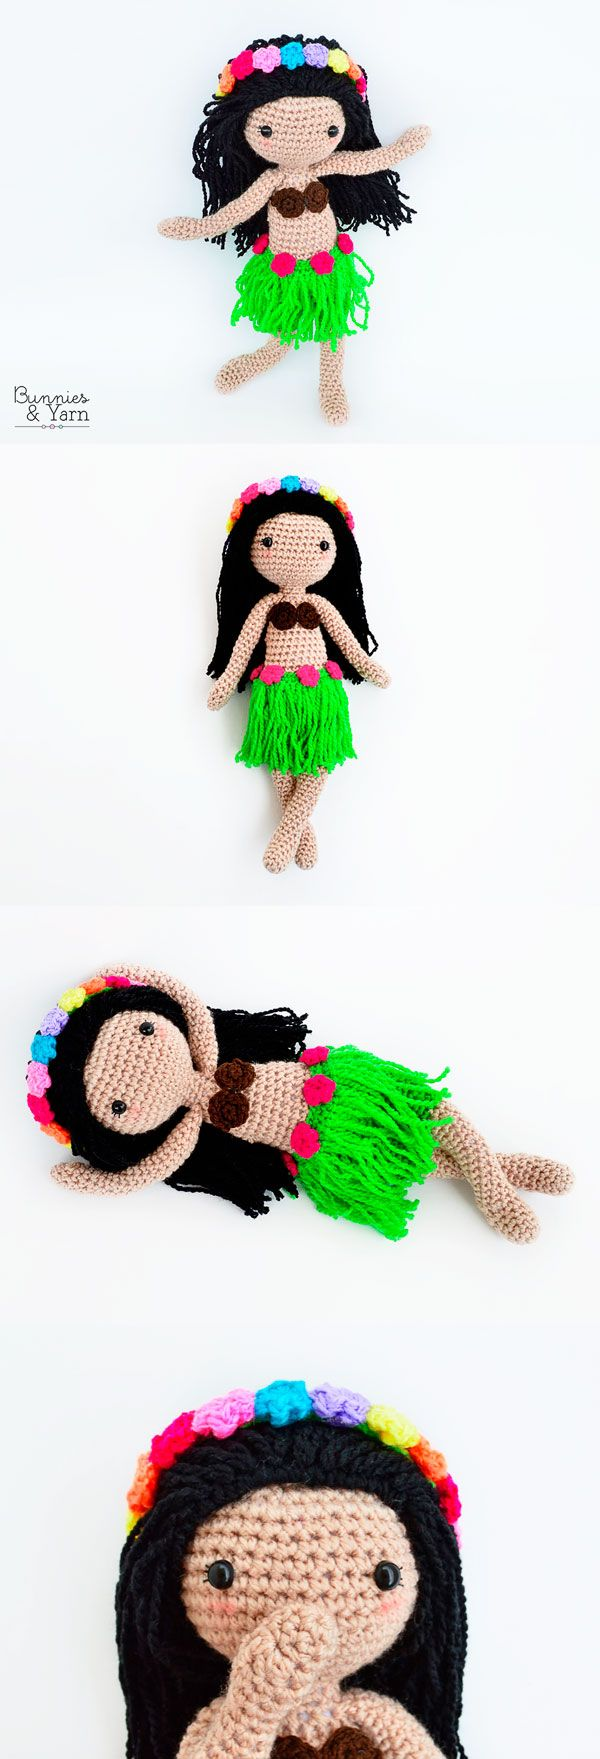 Amigurumi Hawai Doll : 44 best images about moana on Pinterest Disney, Exotic ...